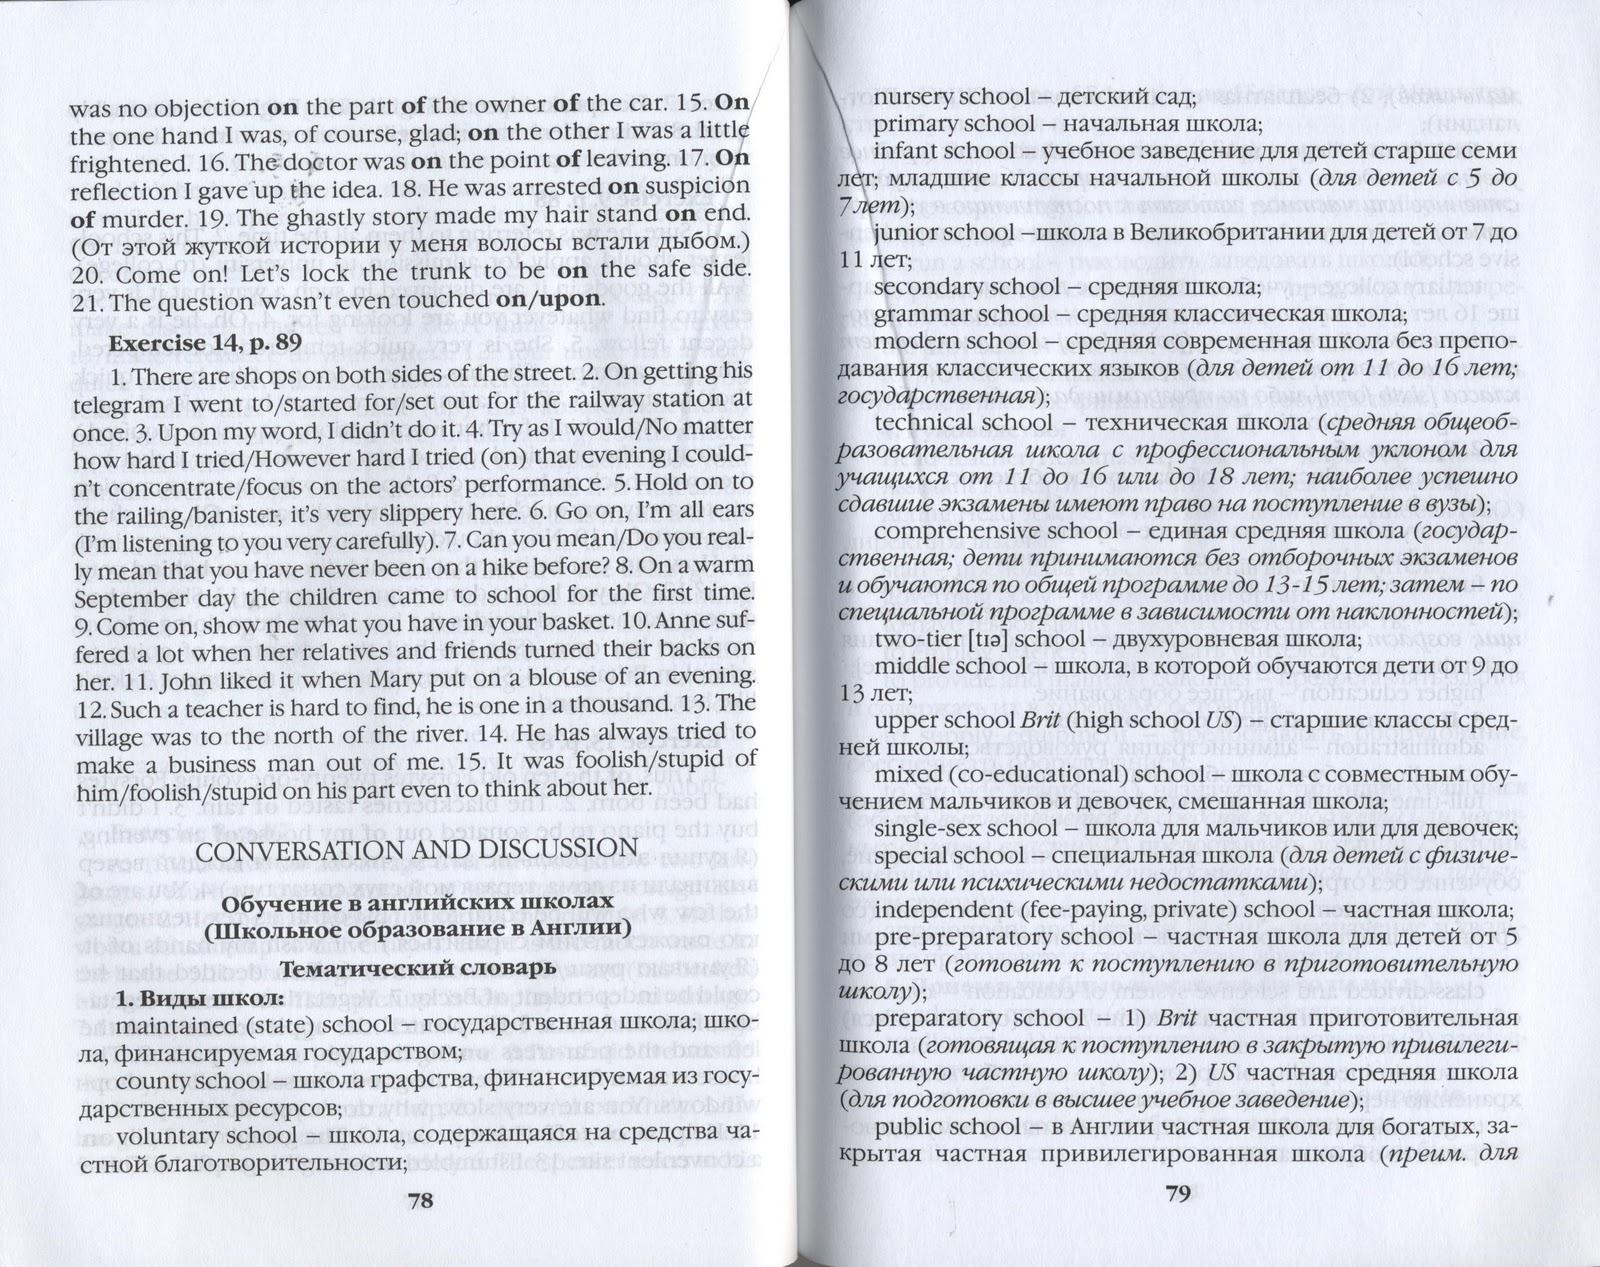 unit 5 7 arakin 5 1 unit 4 christ - malo sisu book 1 unit 7 story the best prince.